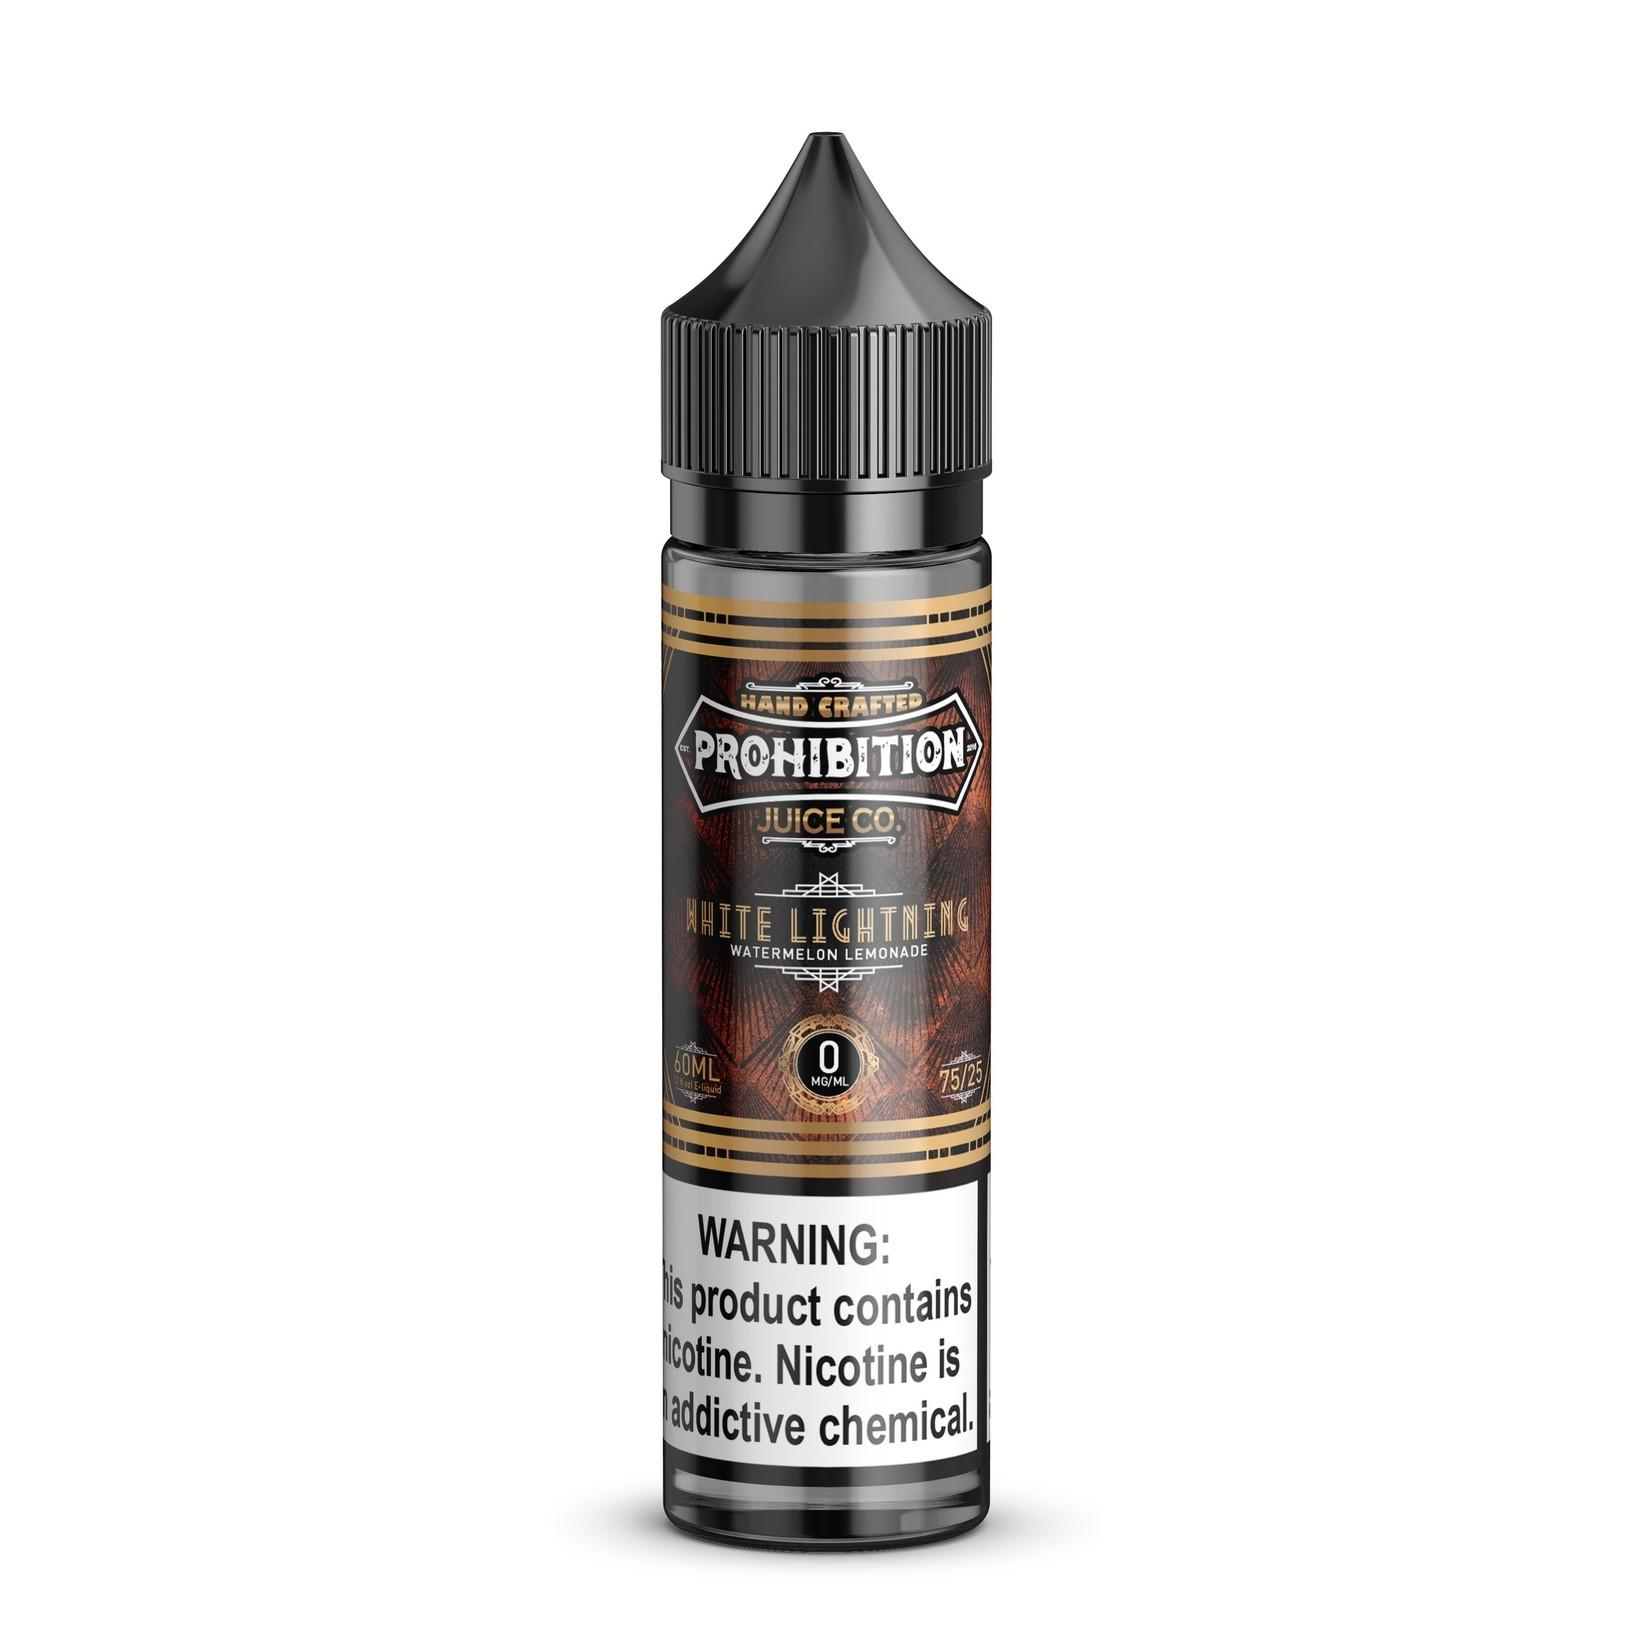 Prohibition White Lightning